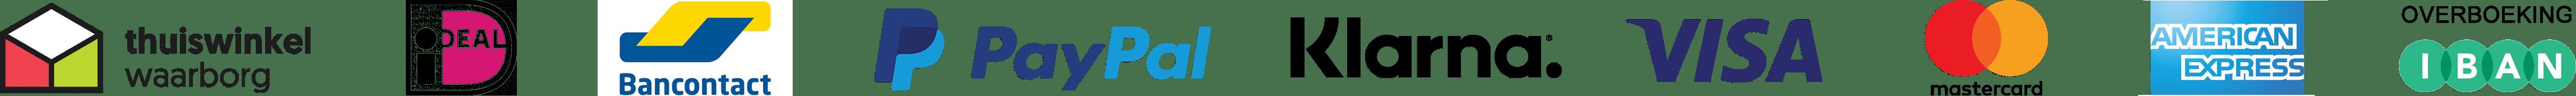 Betaal logo - DeHangmat.nl